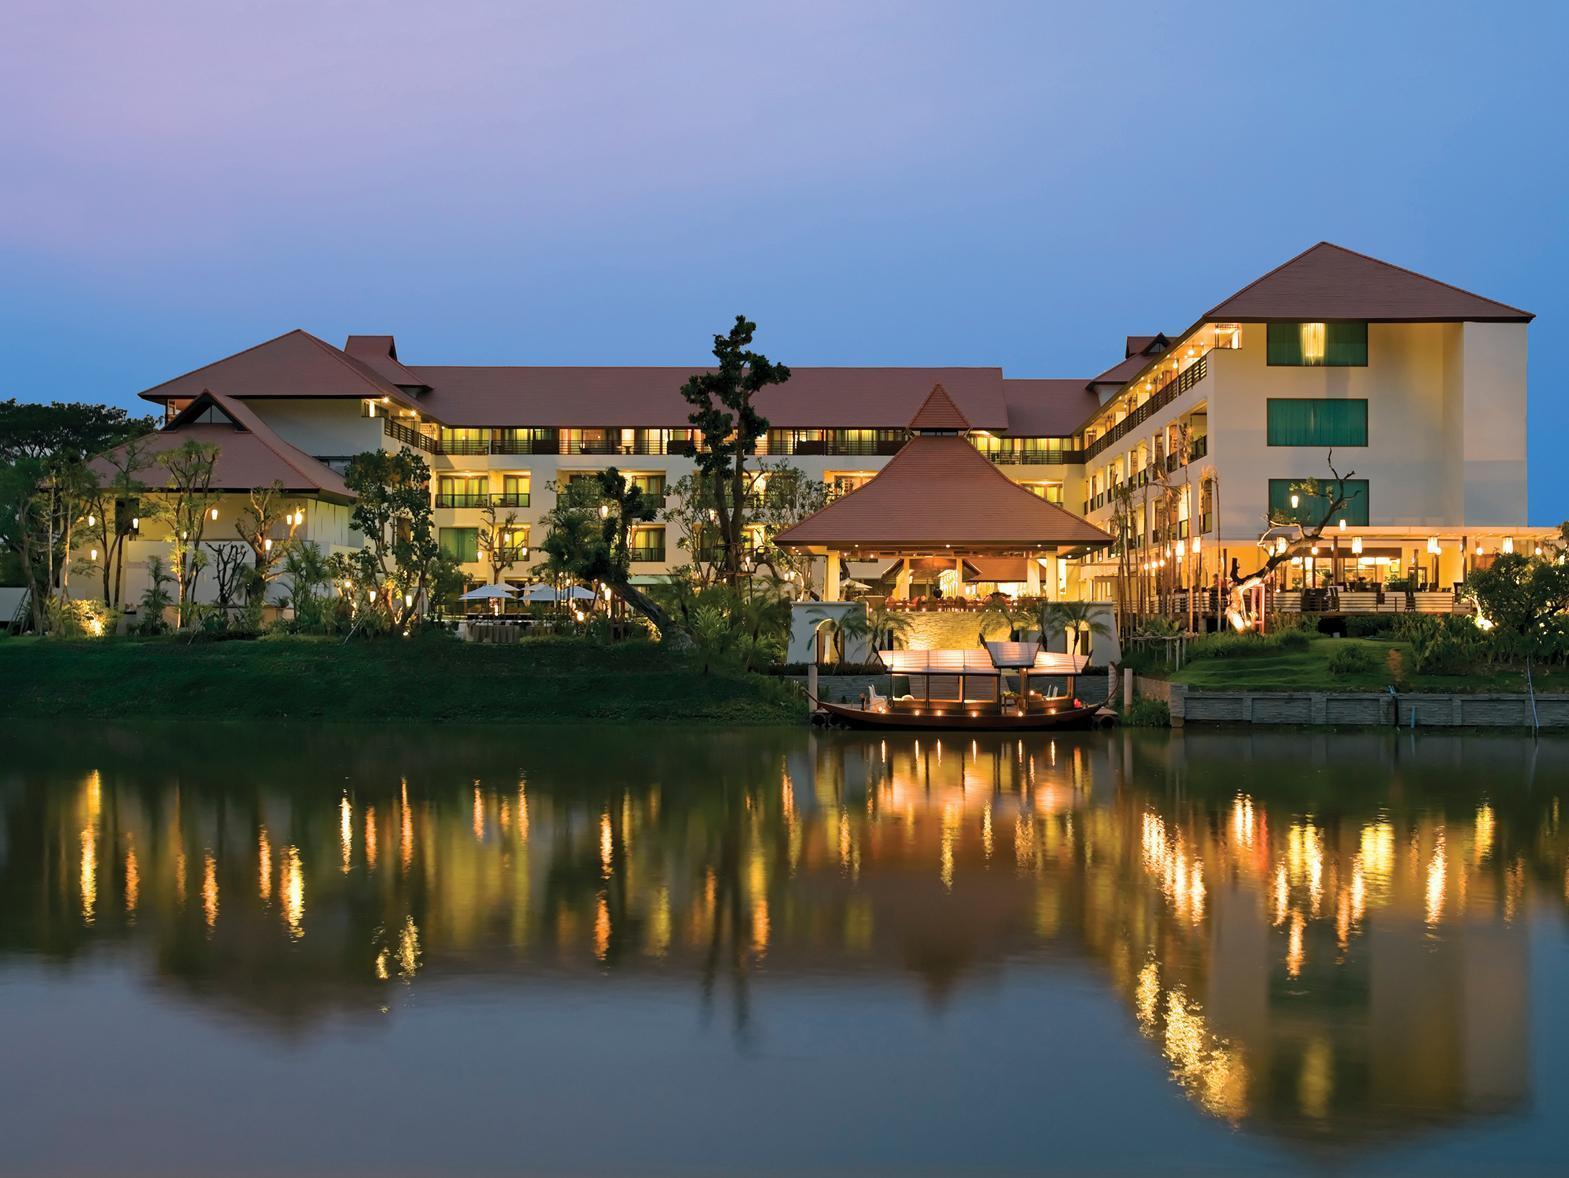 Rati Lanna Riverside Spa Resort รติล้านนา ริเวอร์ไซด์ สปา รีสอร์ต